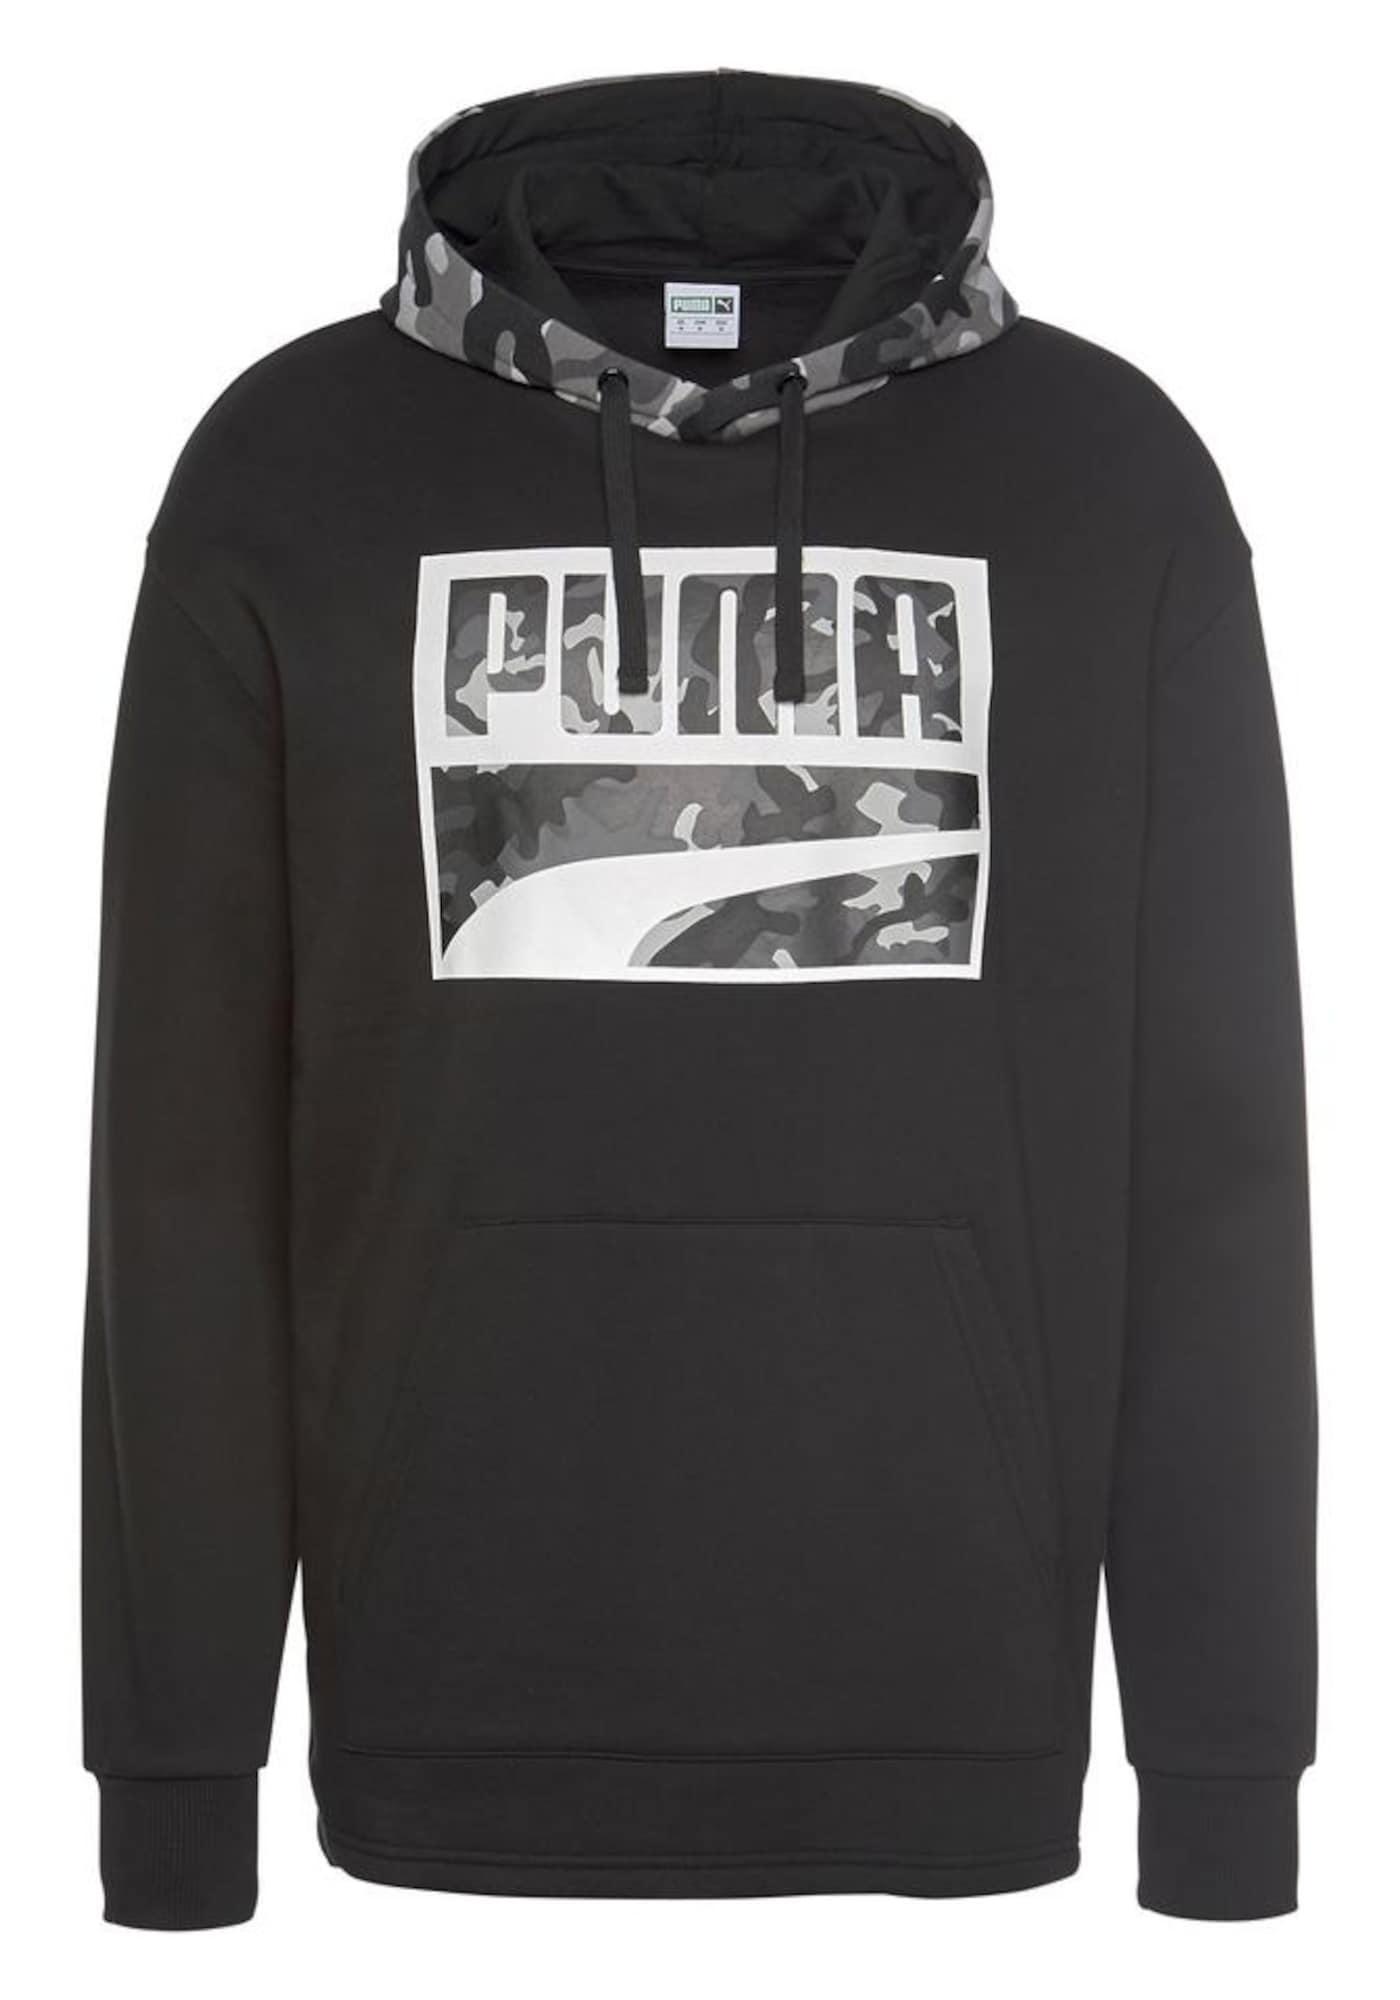 Kapuzensweatshirt | Bekleidung > Sweatshirts & -jacken > Sweatshirts | Grau - Schwarz - Weiß | Puma